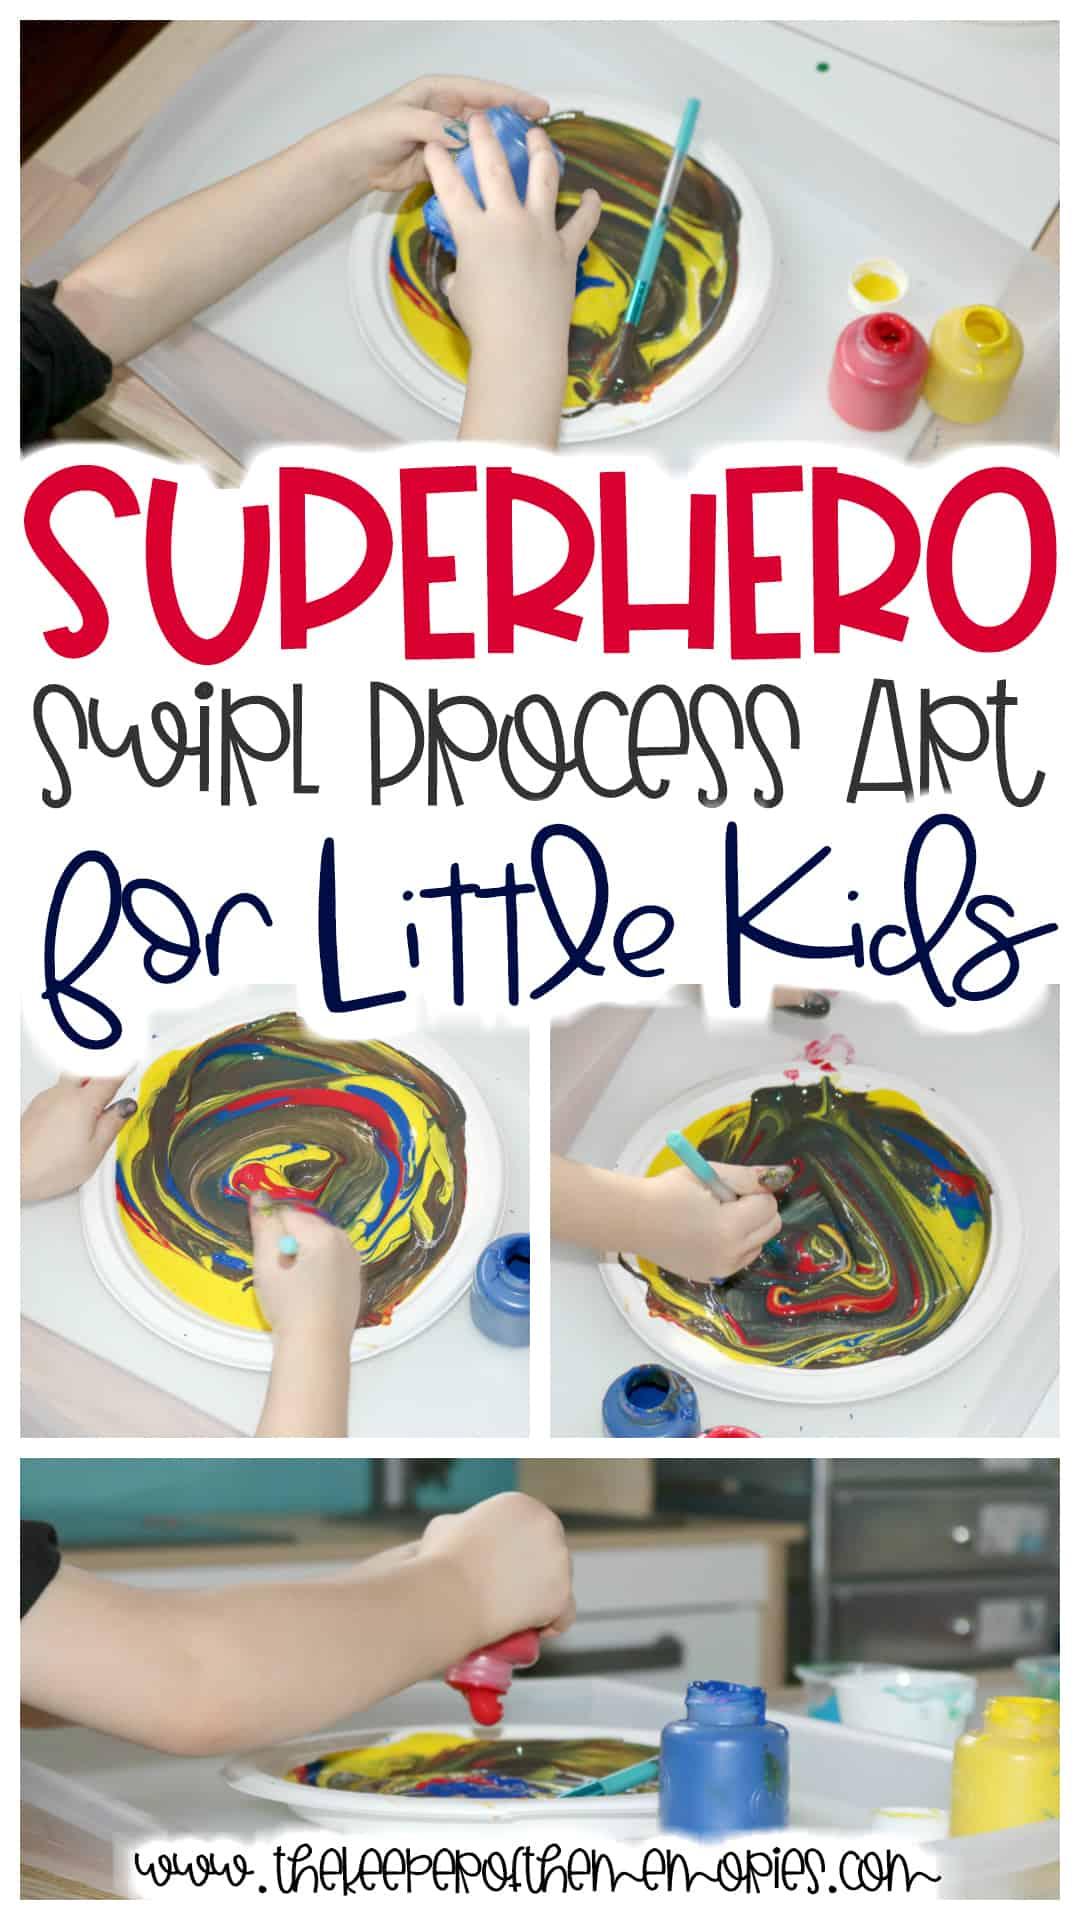 Superhero Swirl Process Art for Little Kids